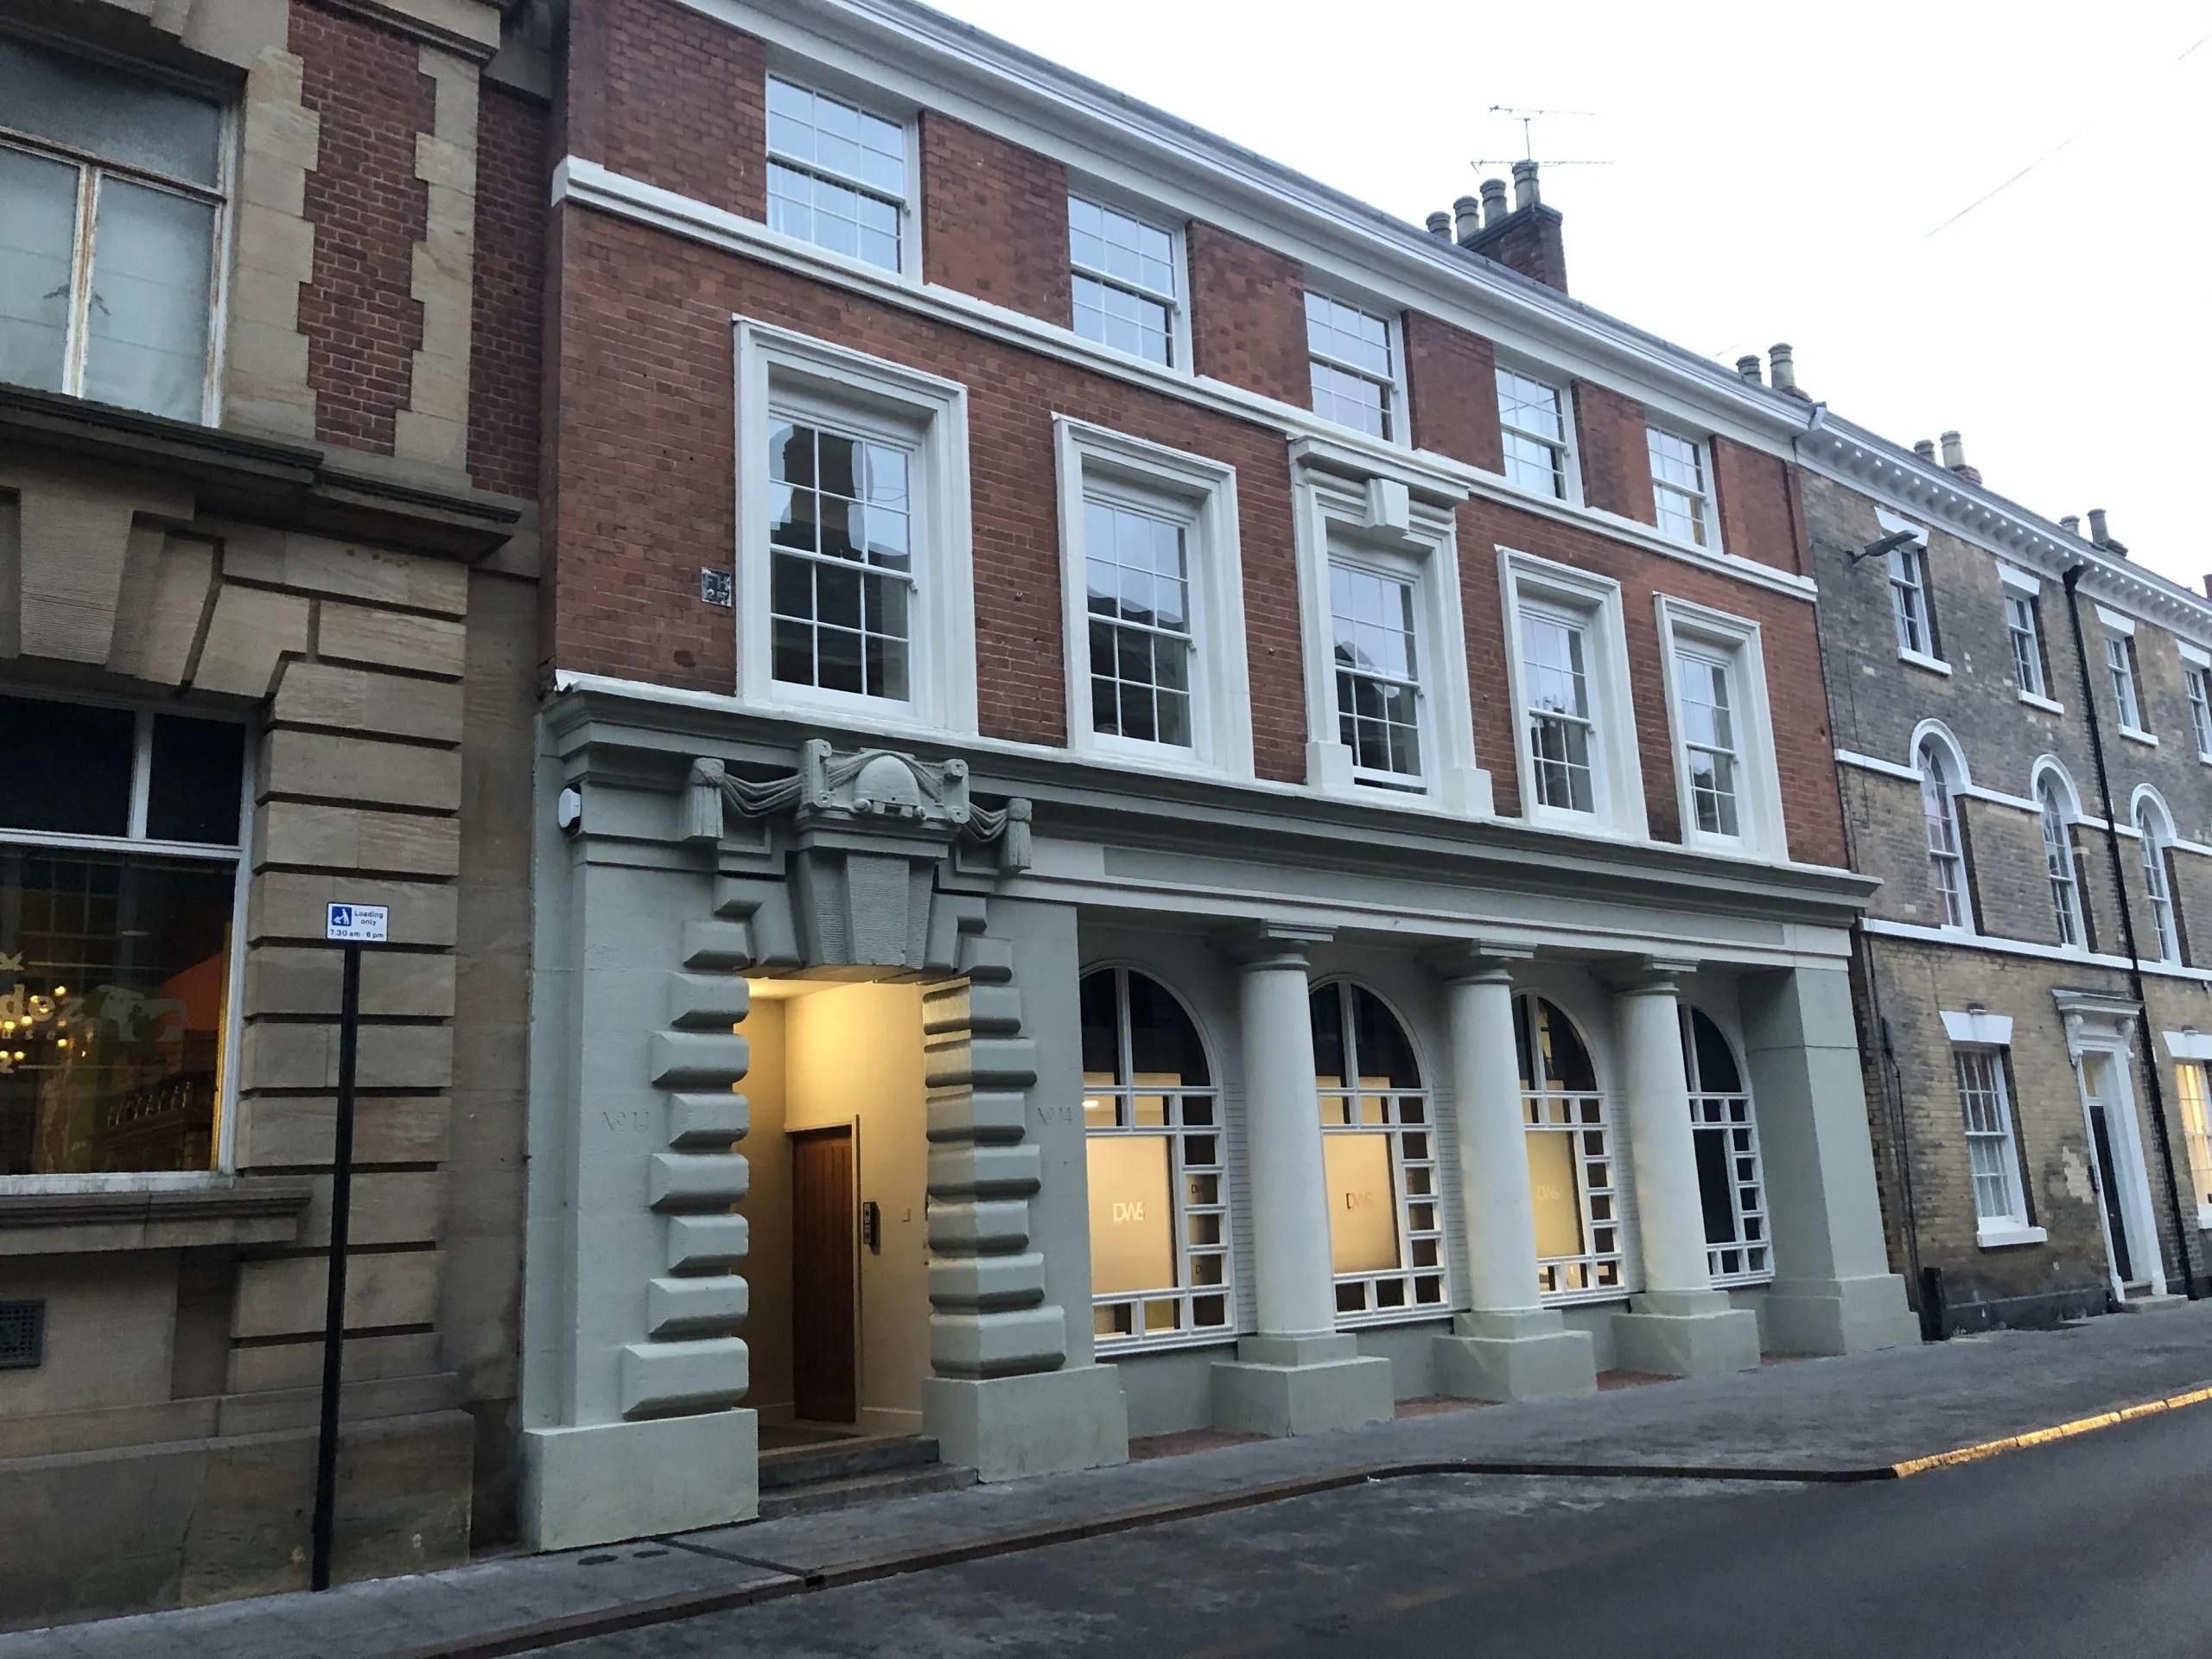 Leicester Greyfriars Heritage Initiative - Restoration - 14-28 Friar Lane